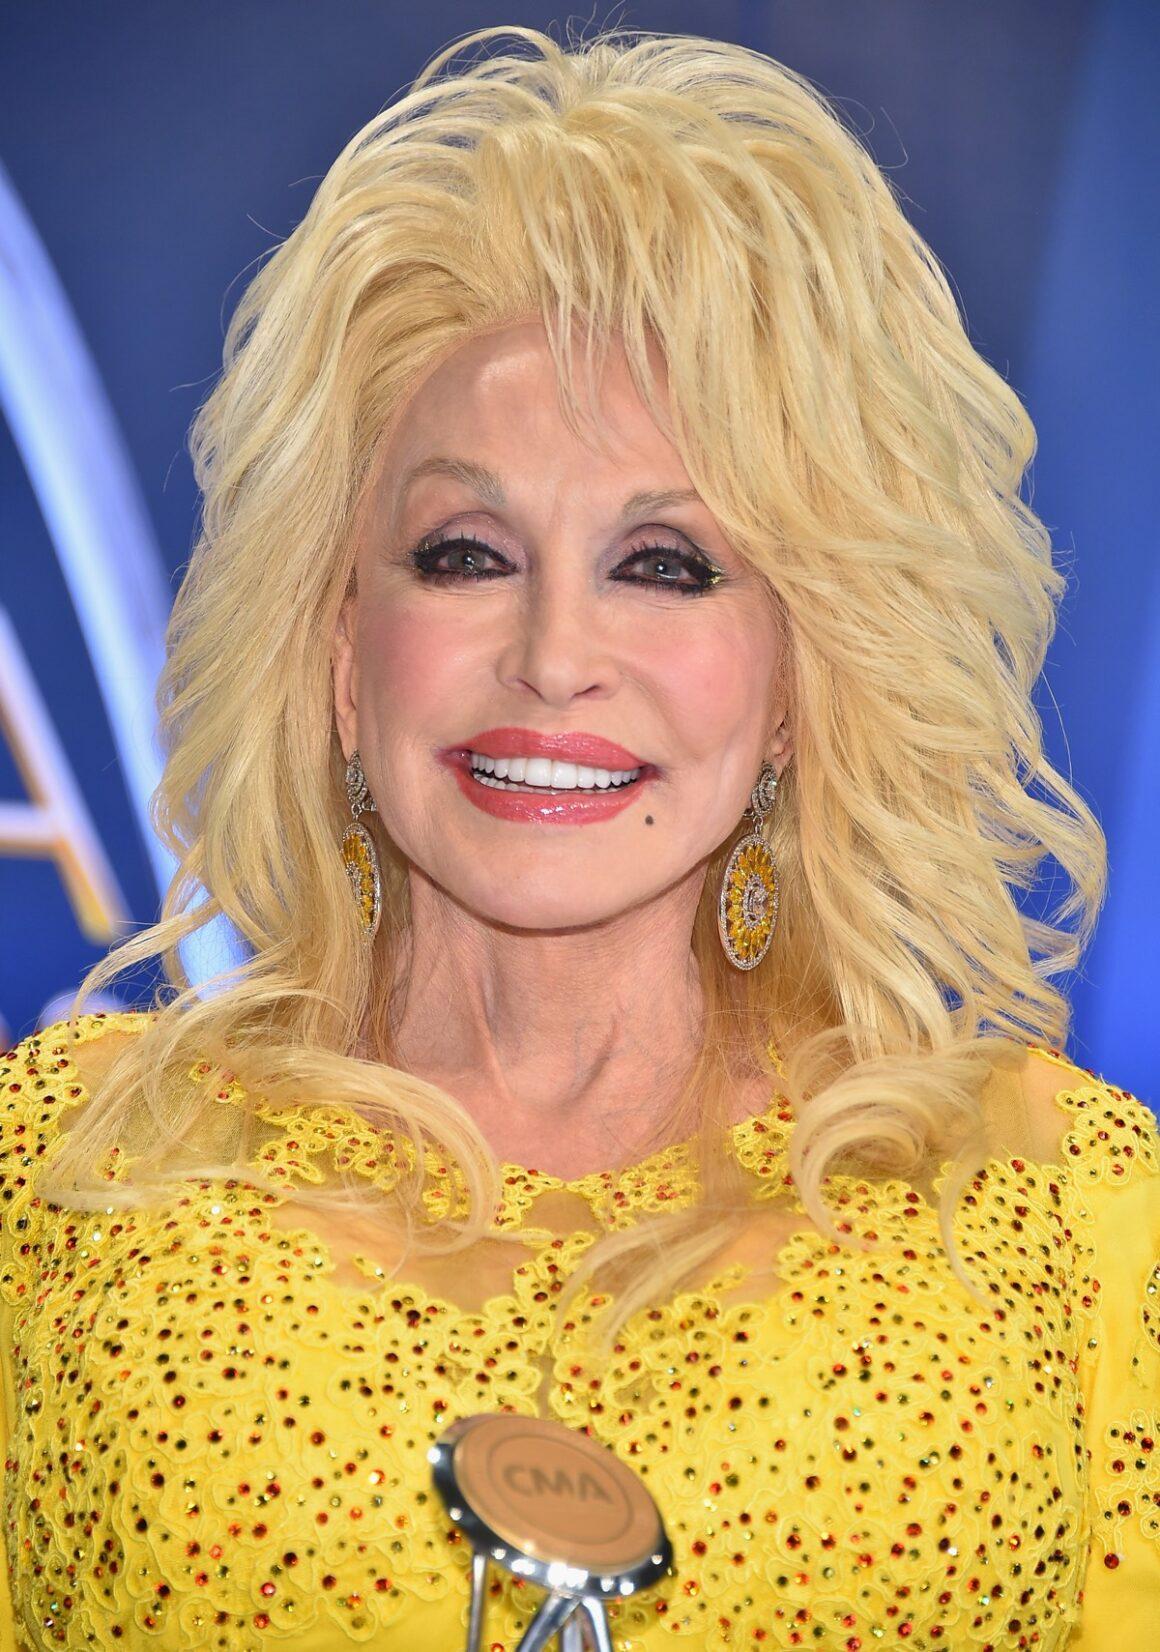 Dolly Parton The 50th Annual CMA Awards - Press Room